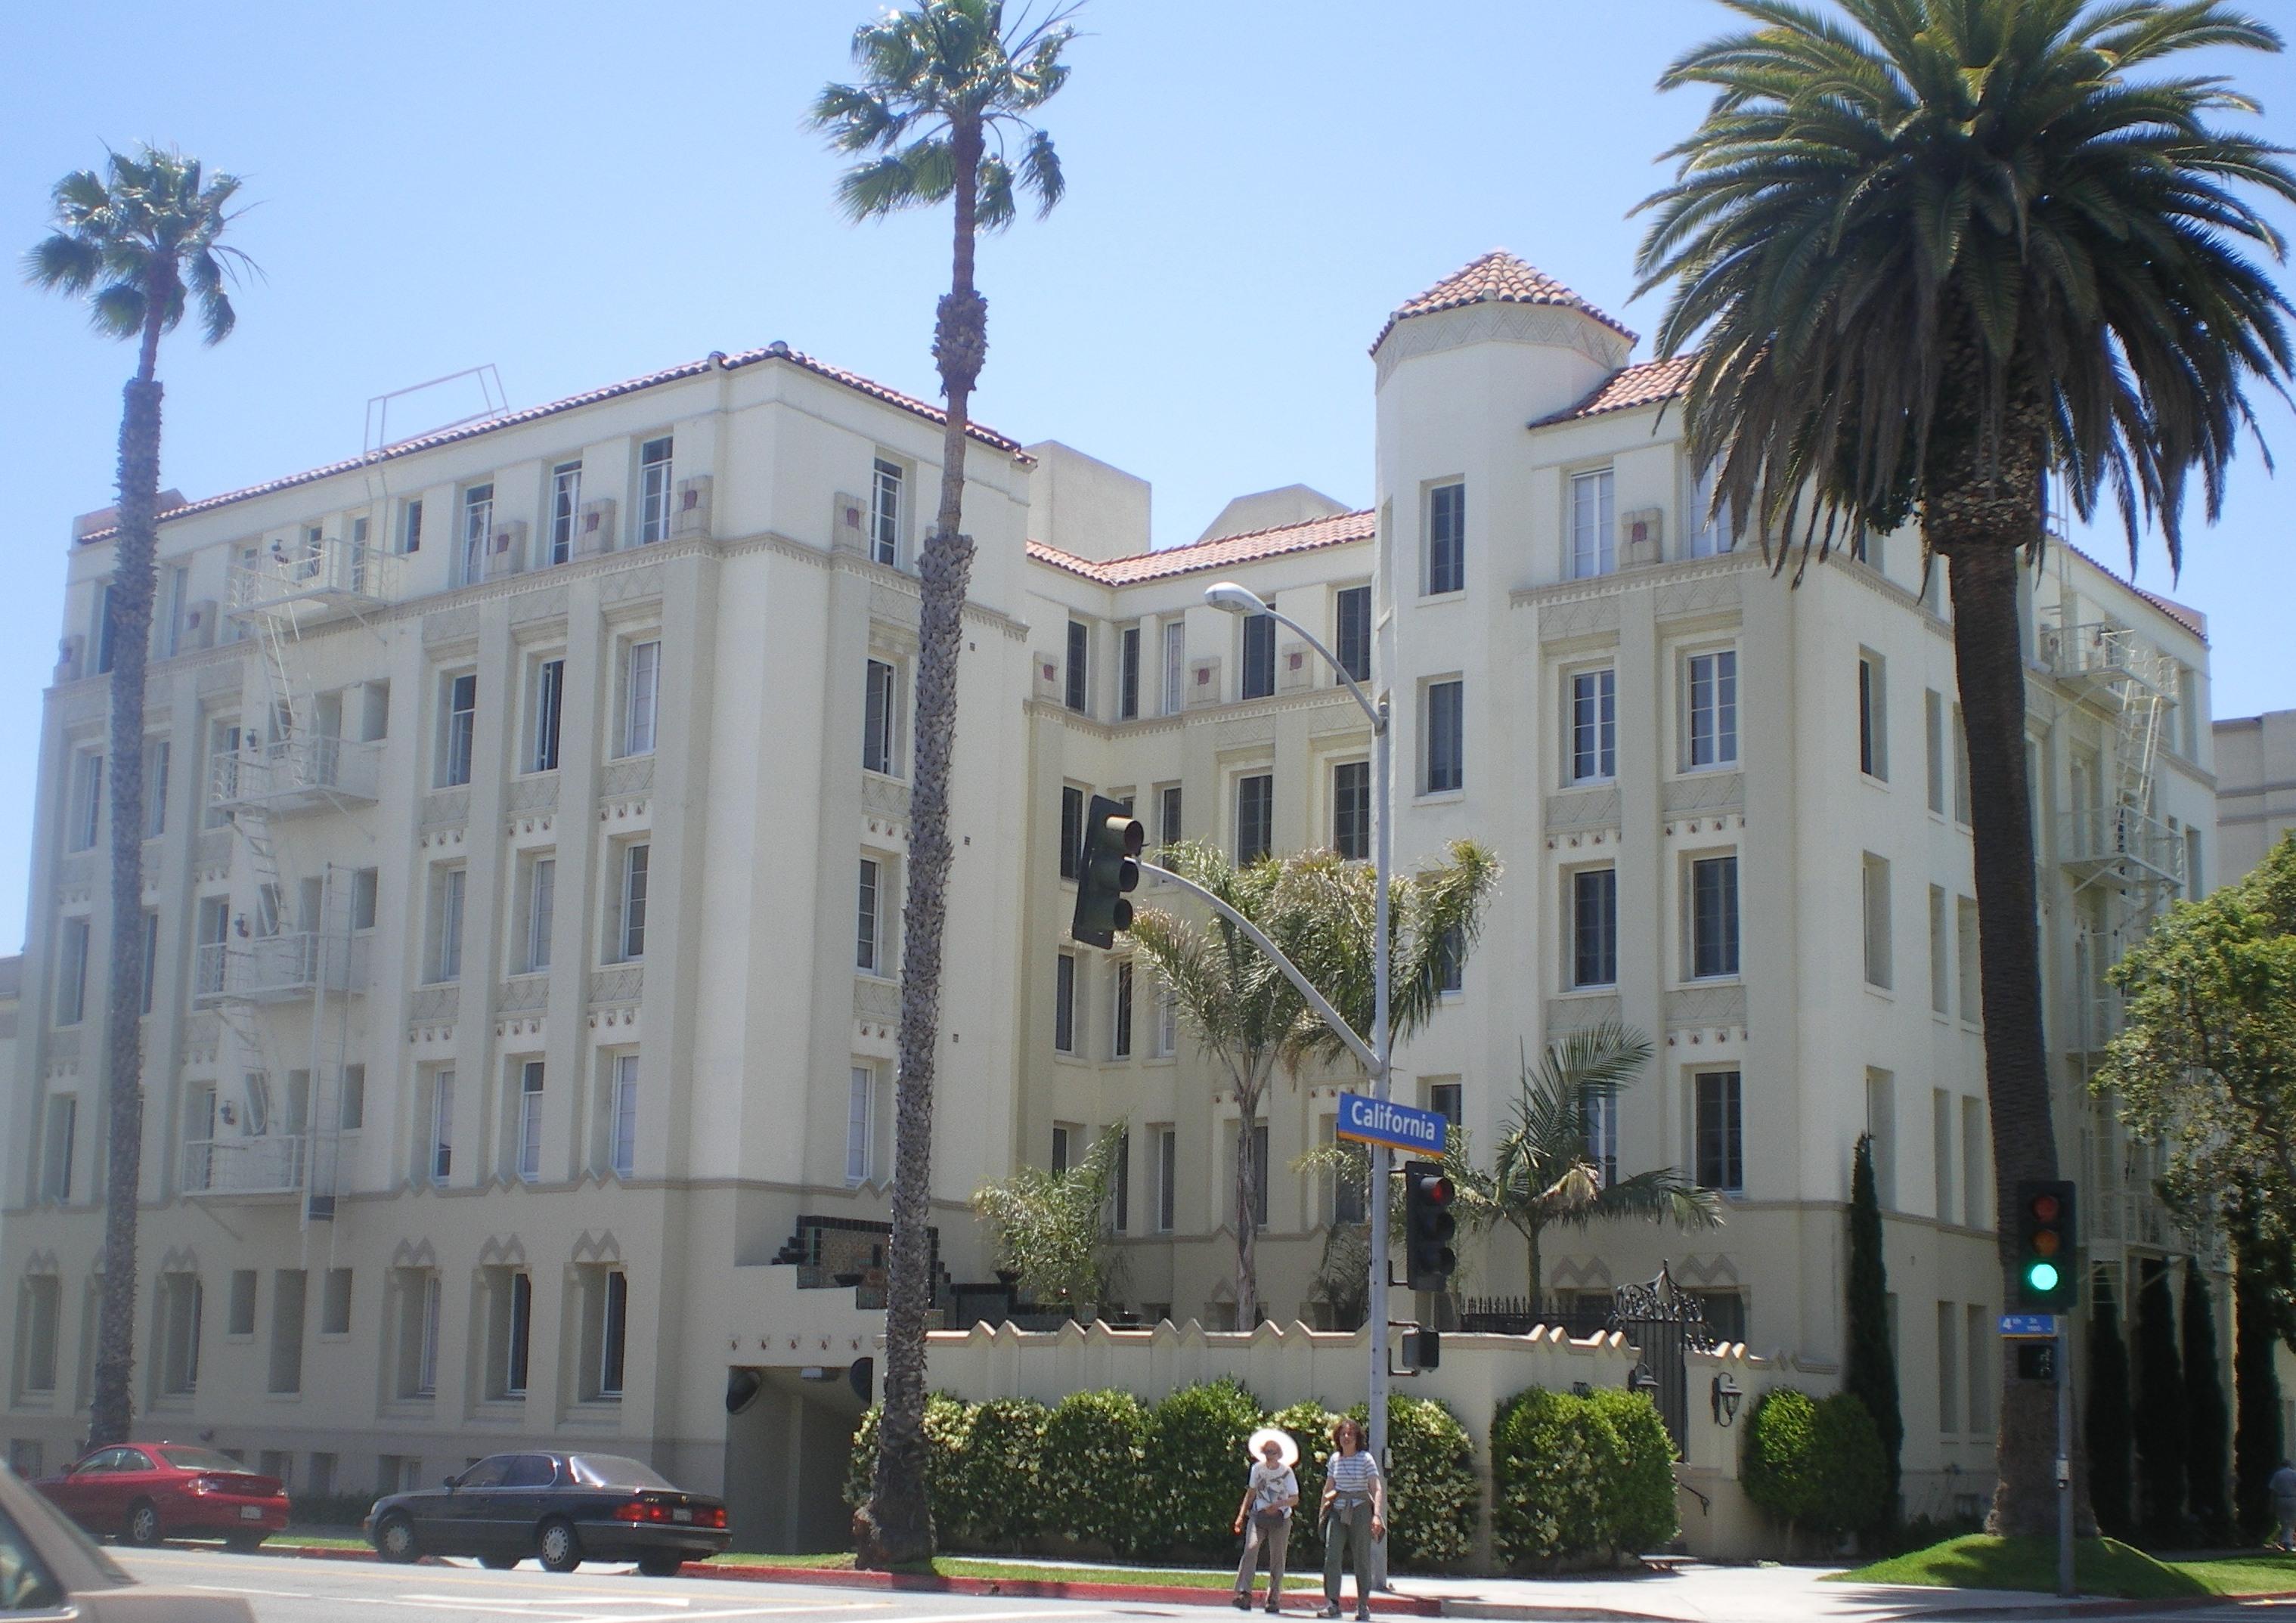 File:Charmont Apartments, Santa Monica.JPG